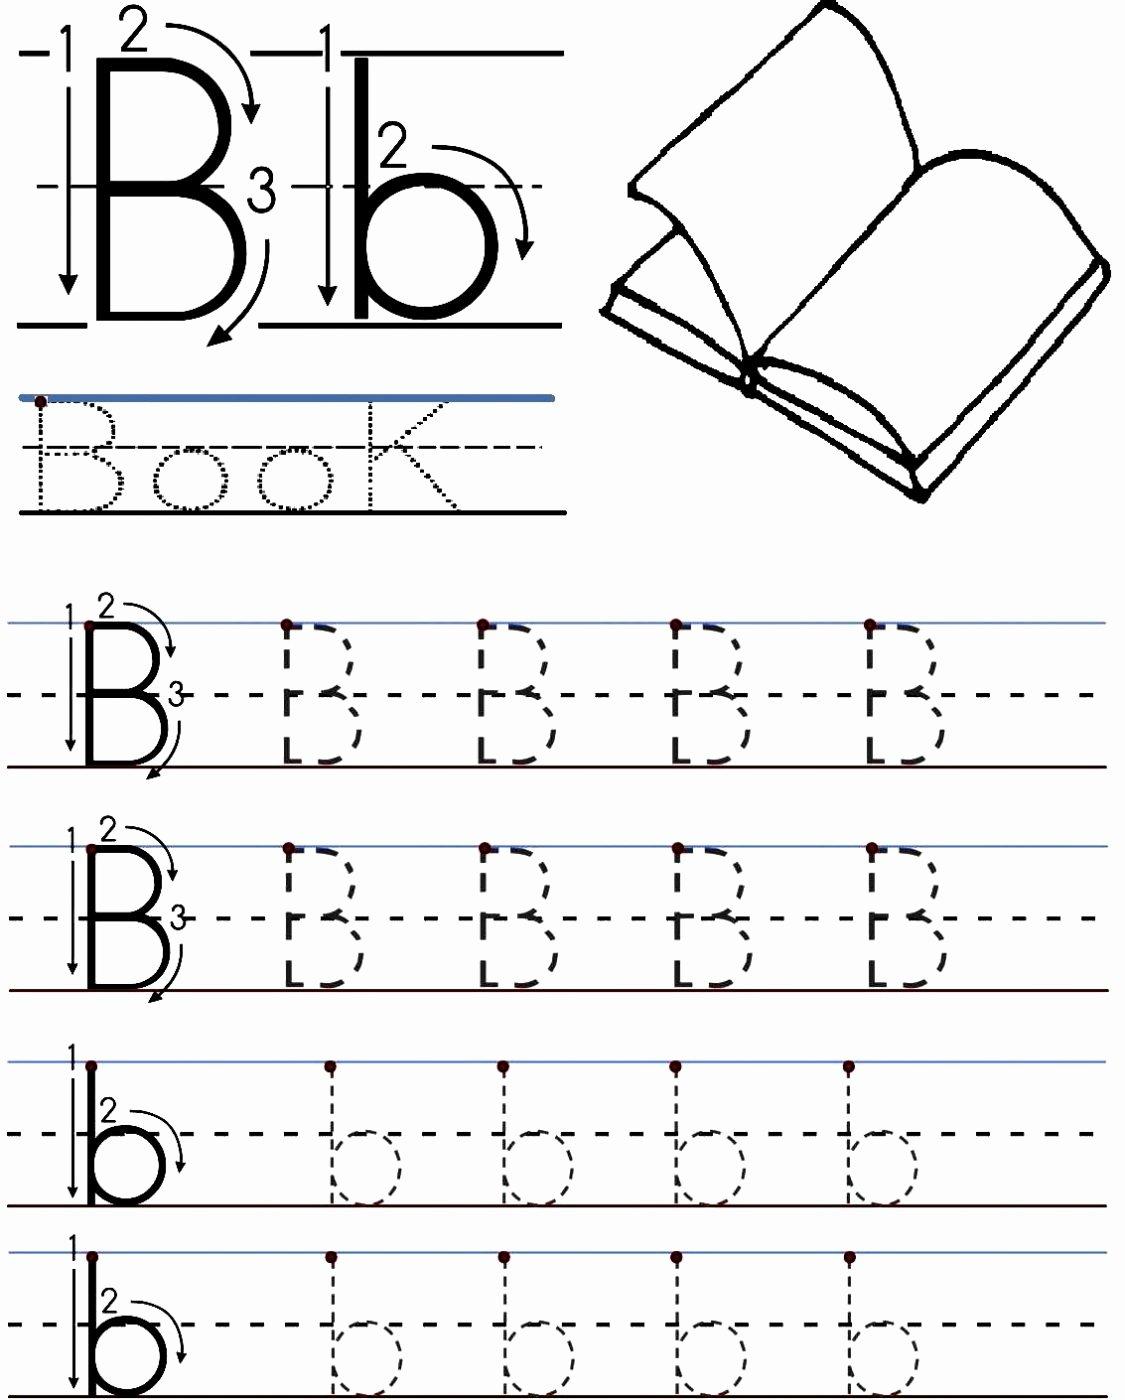 B Worksheets for Preschoolers Printable Letter B Worksheets for Free Download Letter B Worksheets